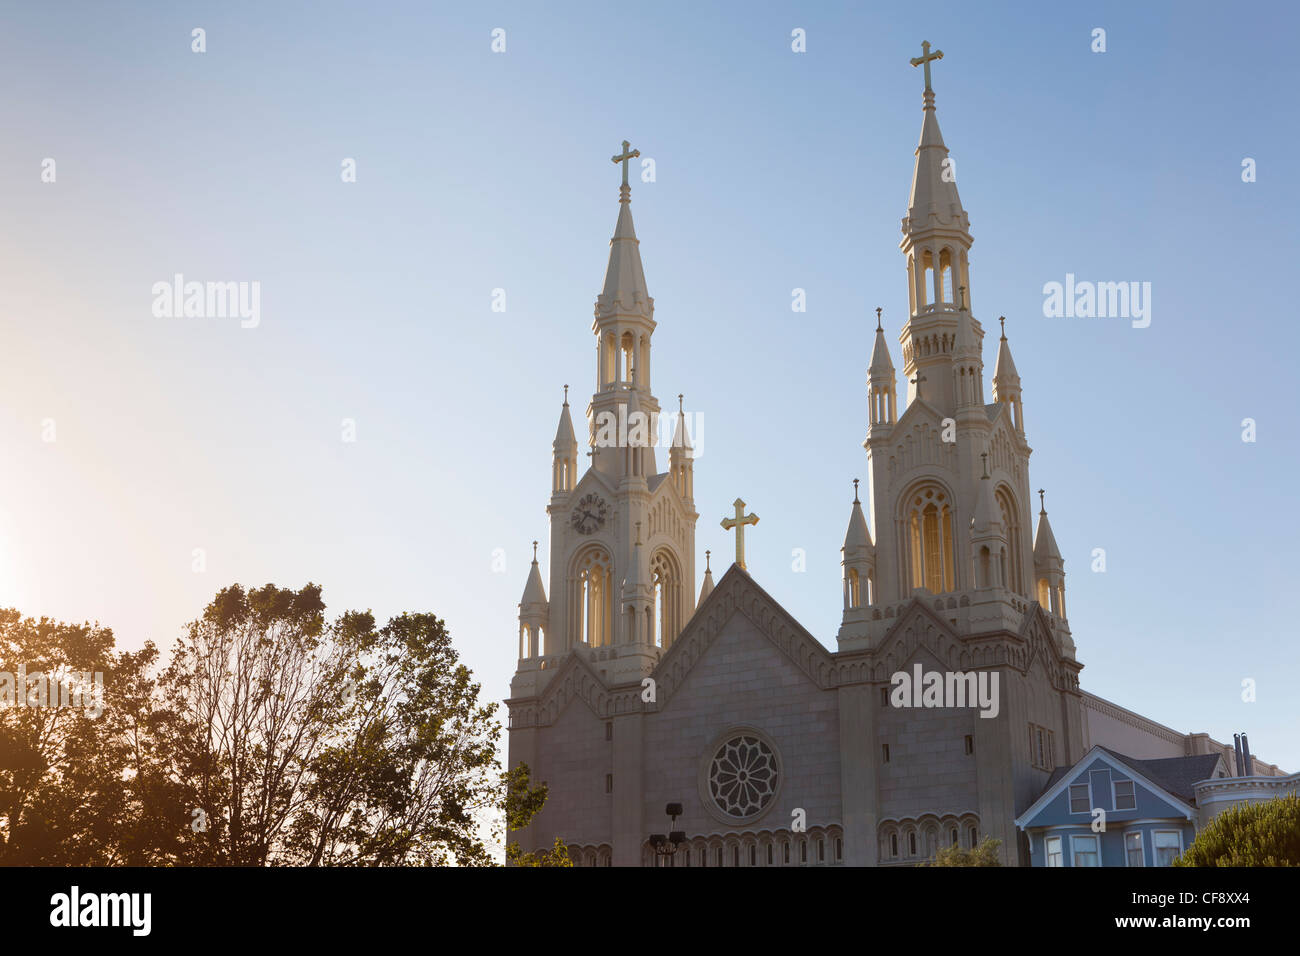 Saint Peter and Paul Church, Detail, Washington Square, San Francisco, California, USA - Stock Image